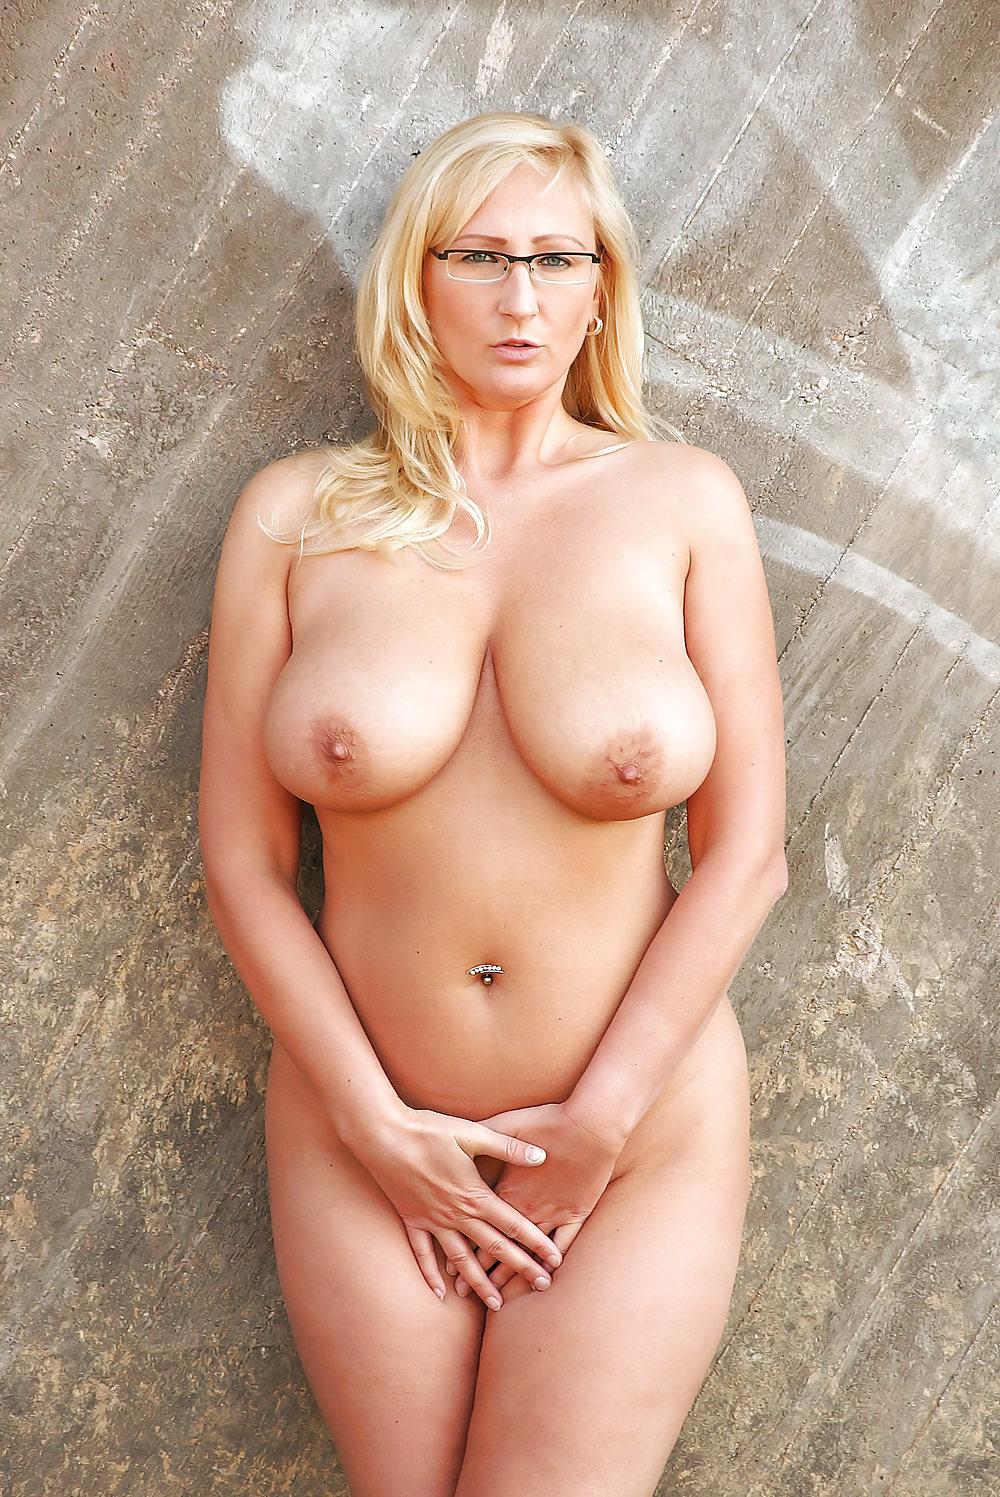 Wolfson cameltoe pictures of kathleen sullivan tits jovovich